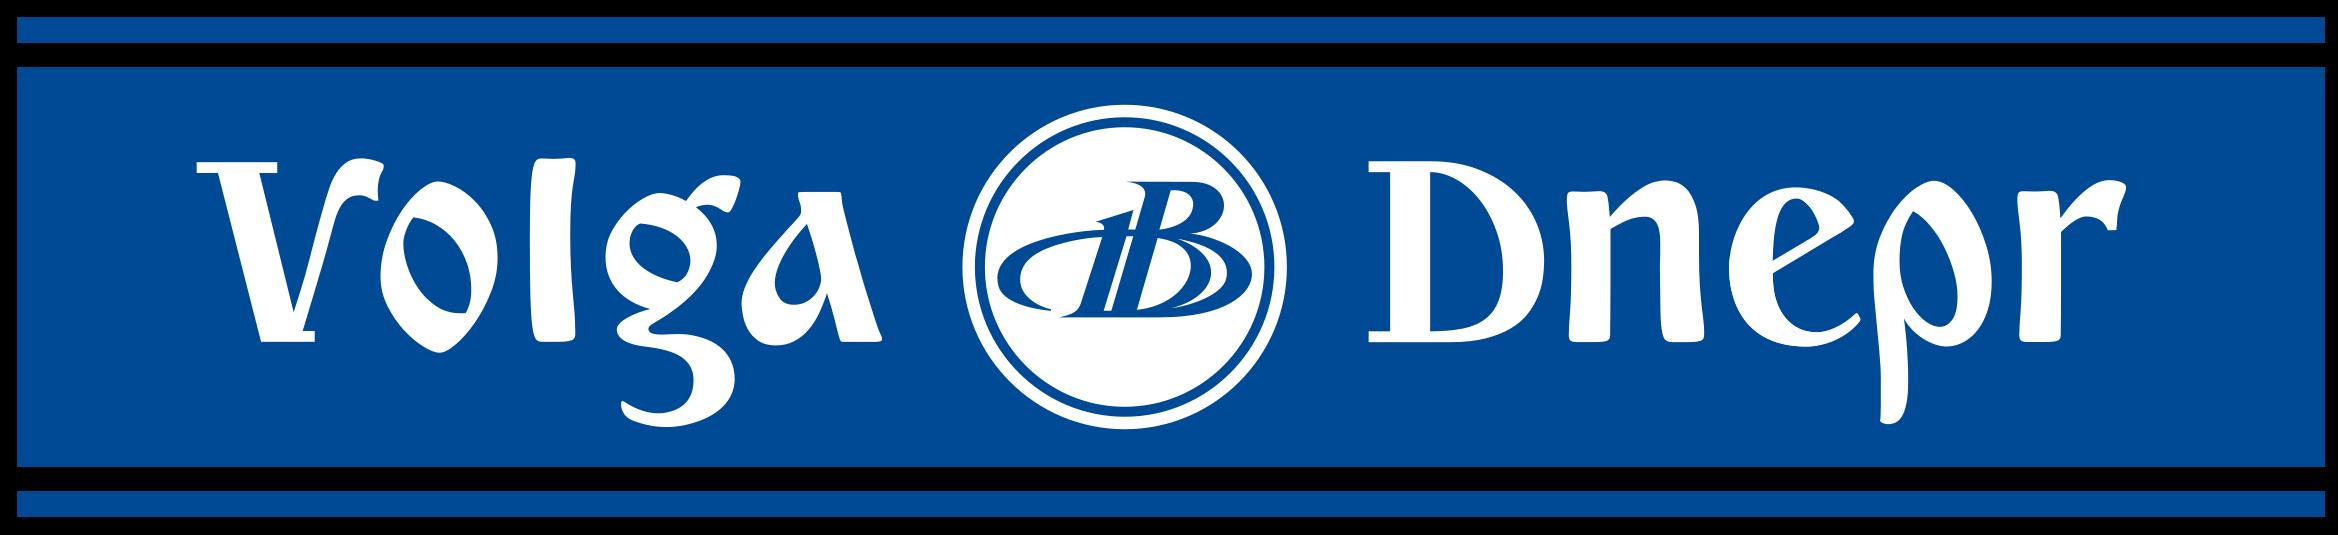 Volga-Dnepr_Airlines-Logo.wine